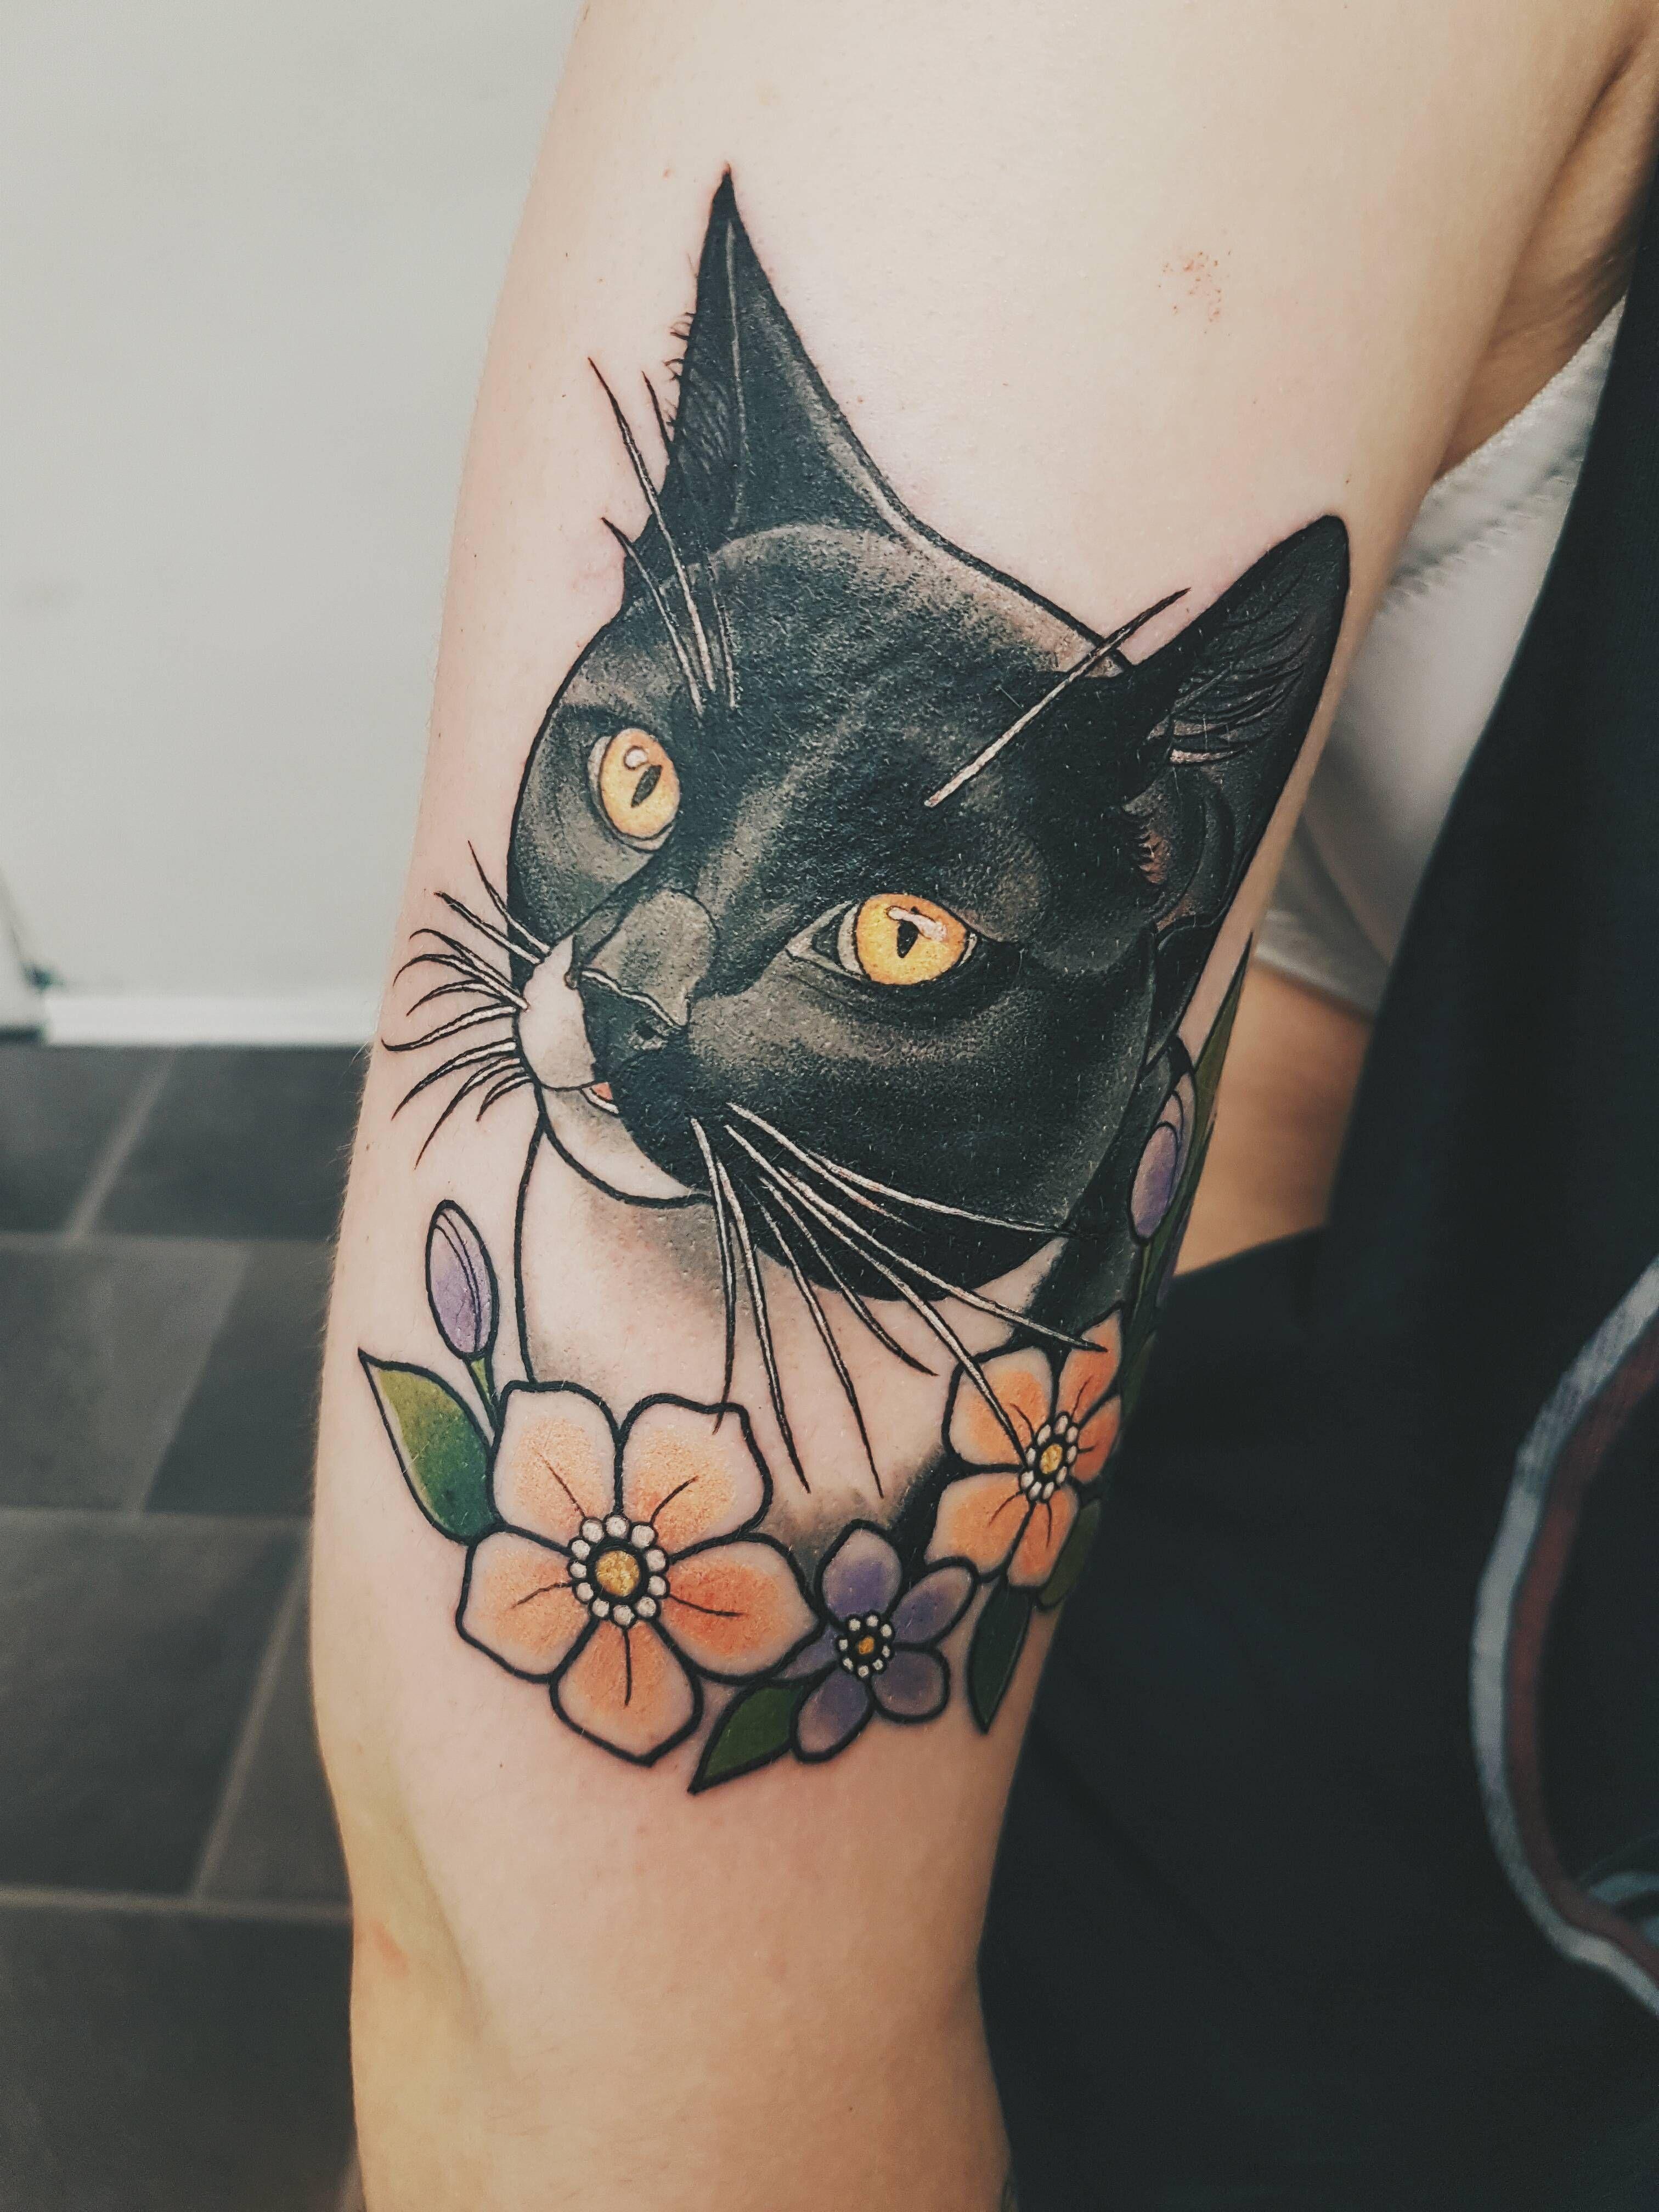 I got my cat tattooed on my arm today! Done by Marielle @ BLEKK Oslo